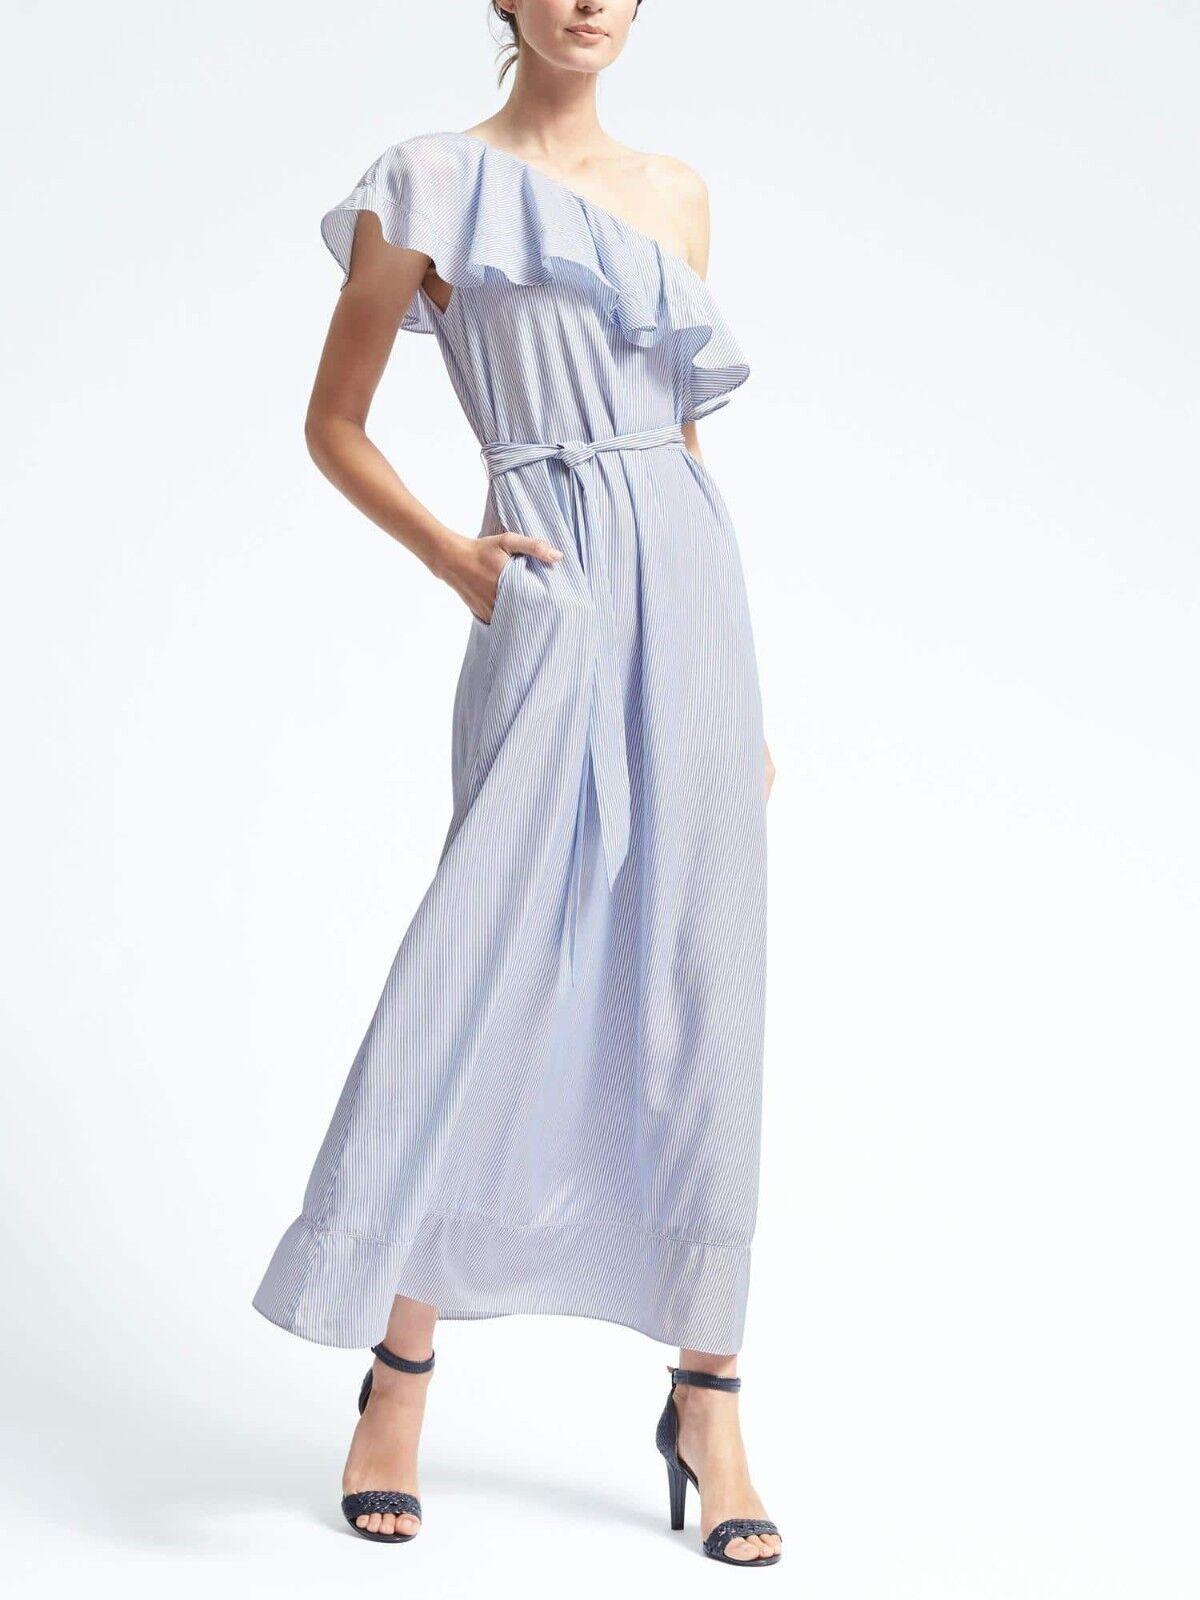 Banana Republic Stripe One-Shoulder Maxi Dress, Weiß Blau Größe SP S P